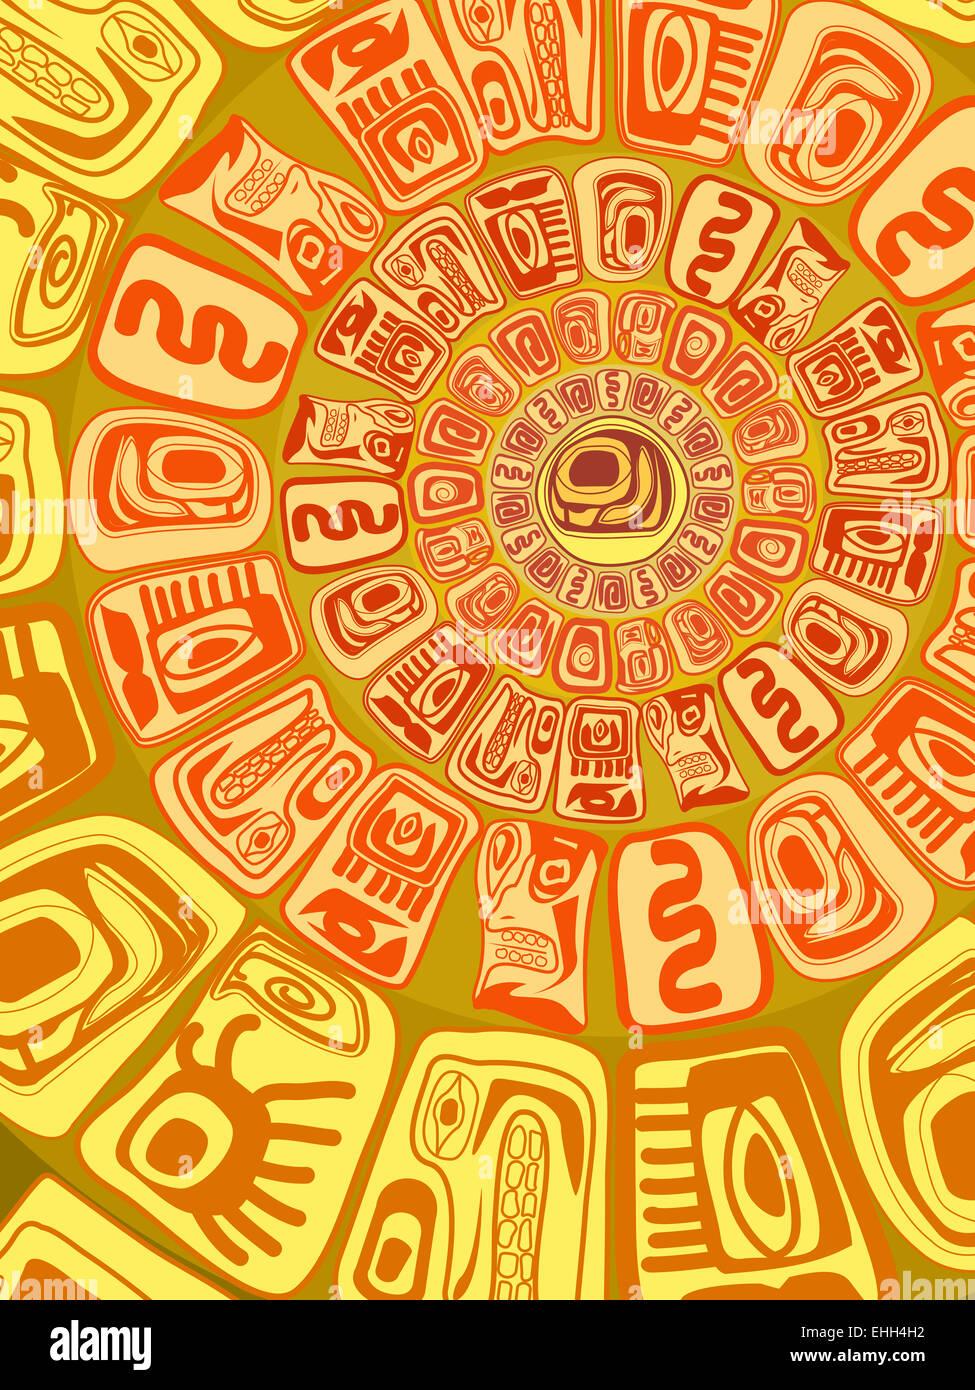 background - primitive figures - Stock Image